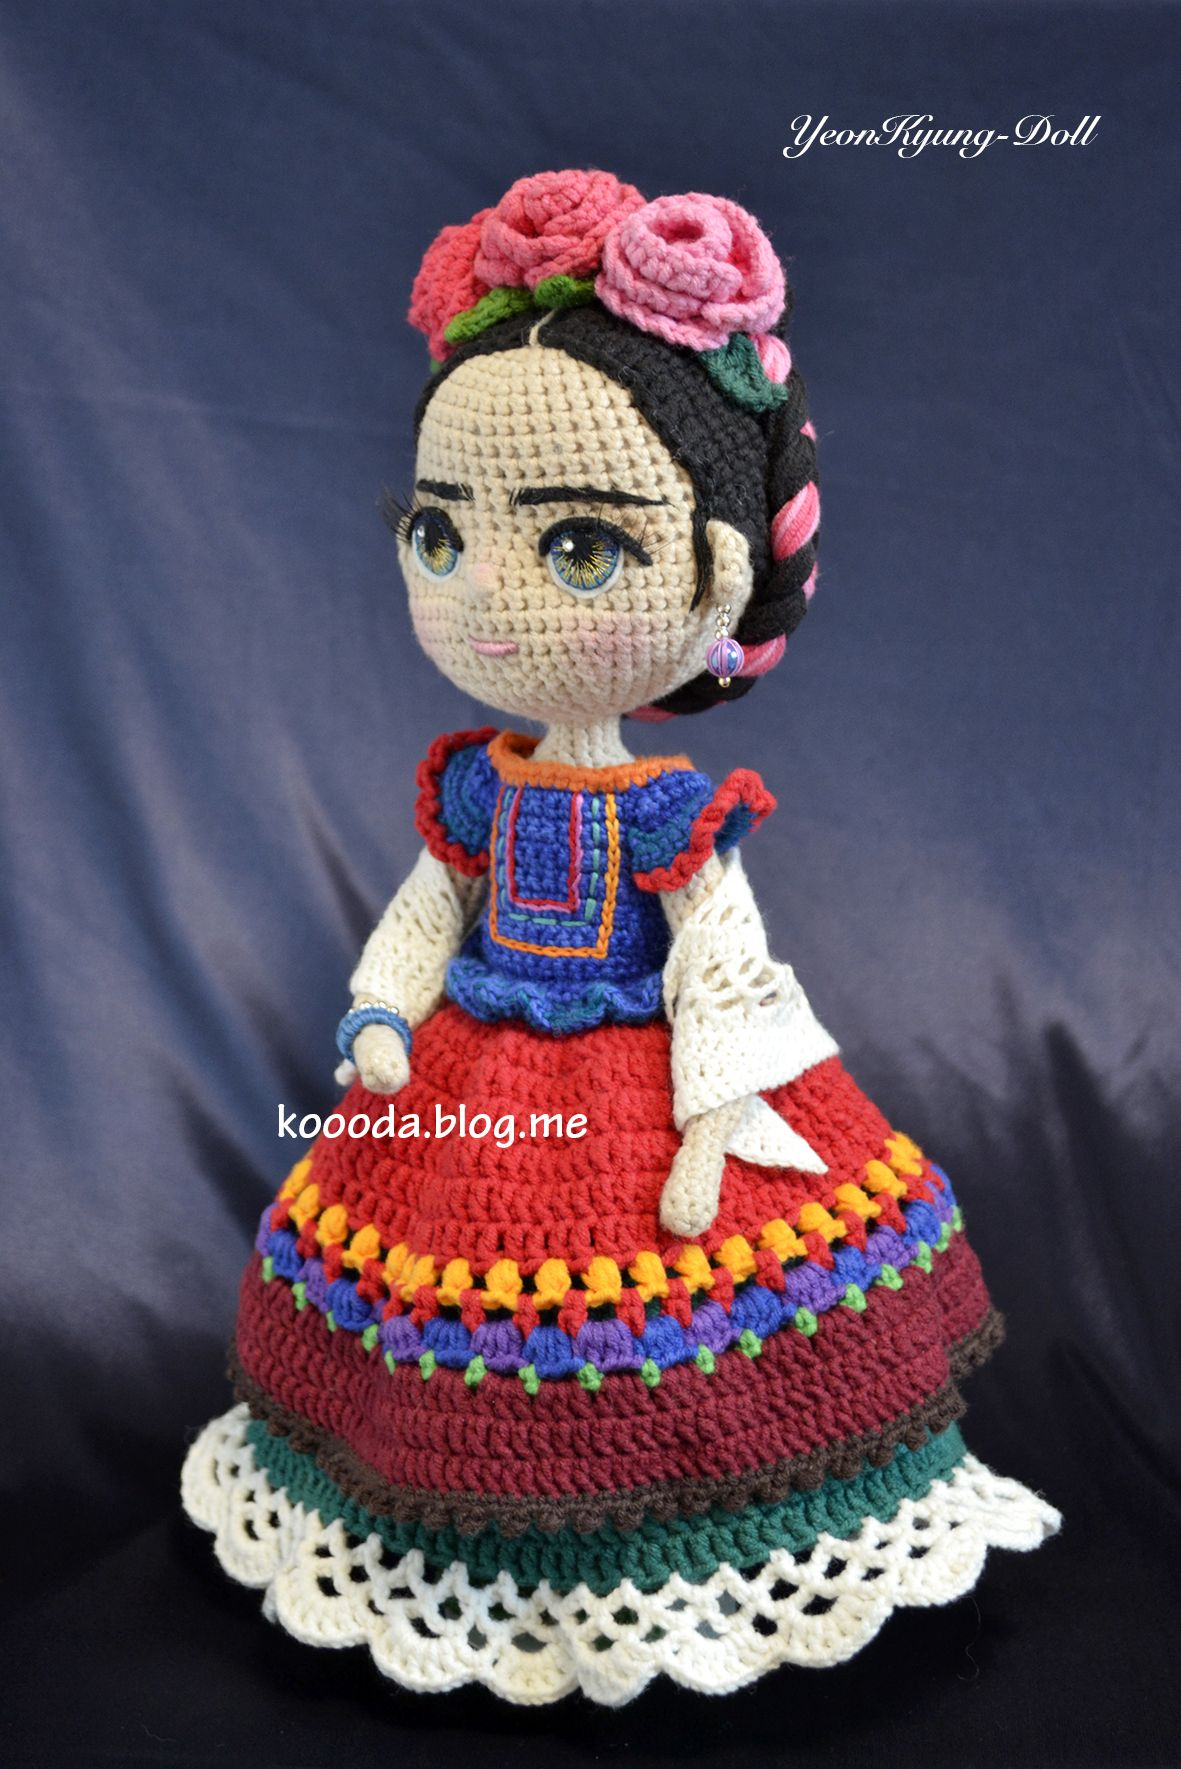 Frida Kahlo. crochet. amigurumi doll | muñecas tejidas | Pinterest ...